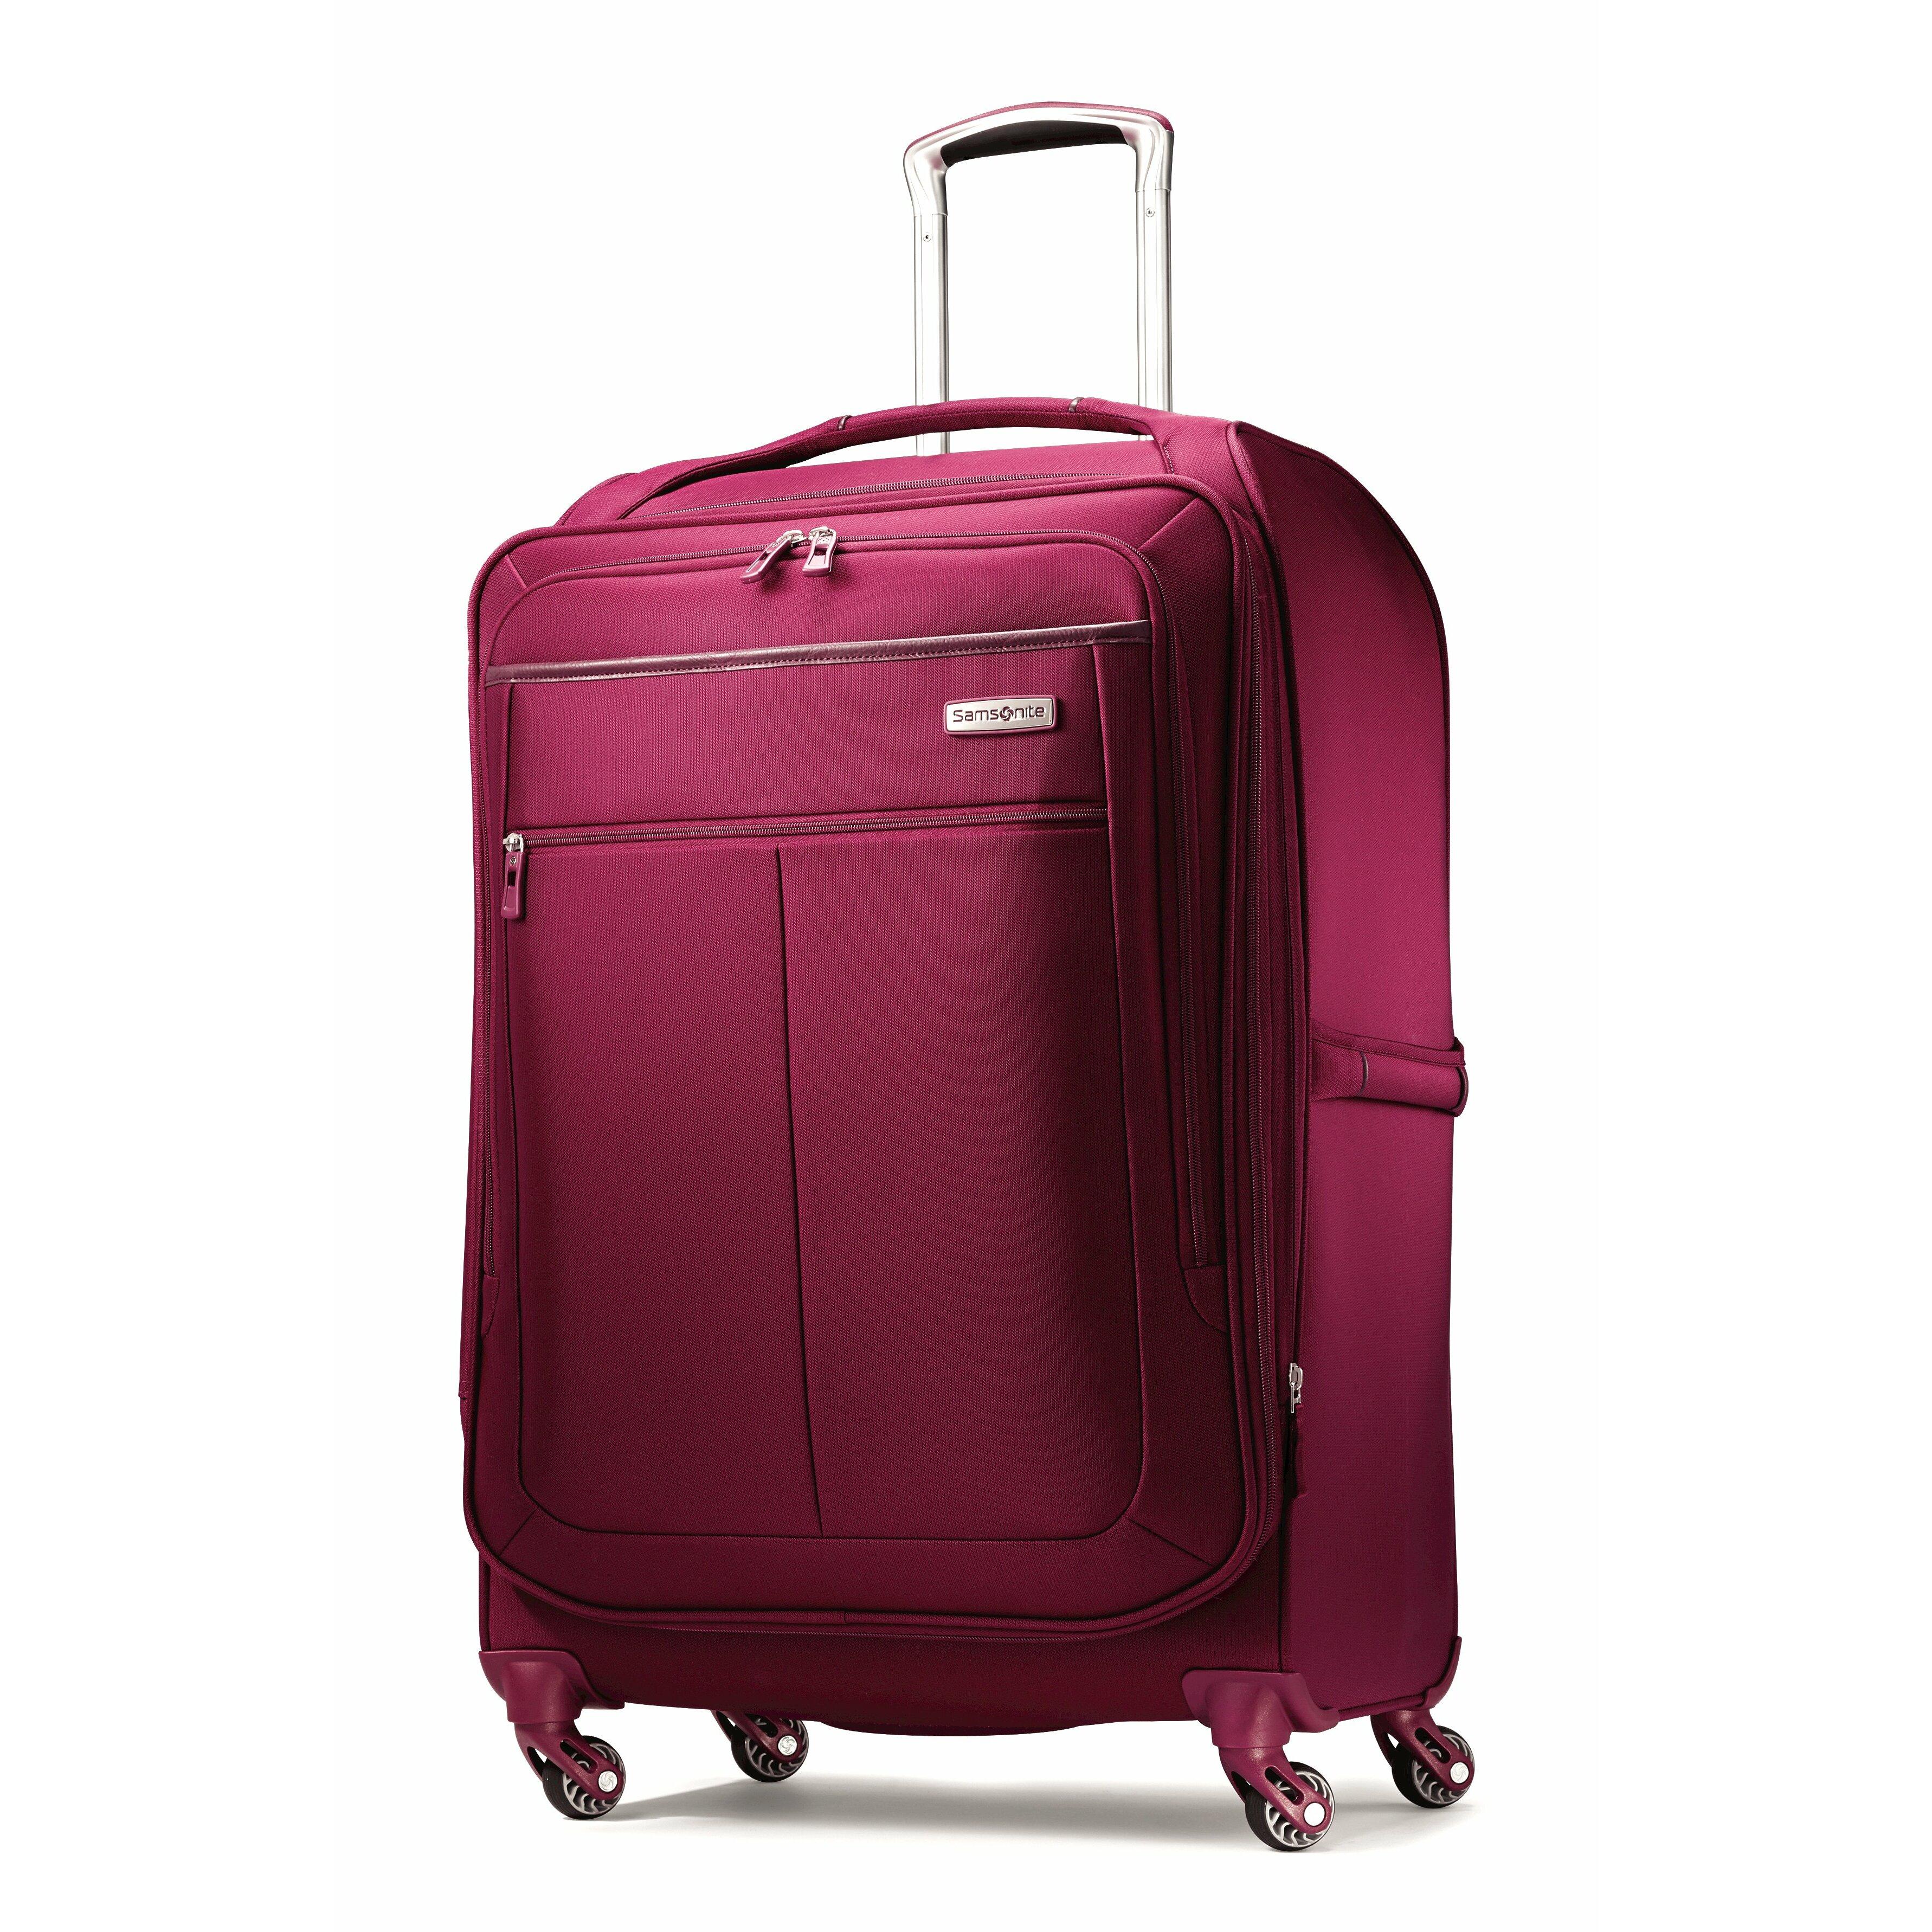 347c363222 Samsonite Mightlight 25 Spinner Suitcase on PopScreen